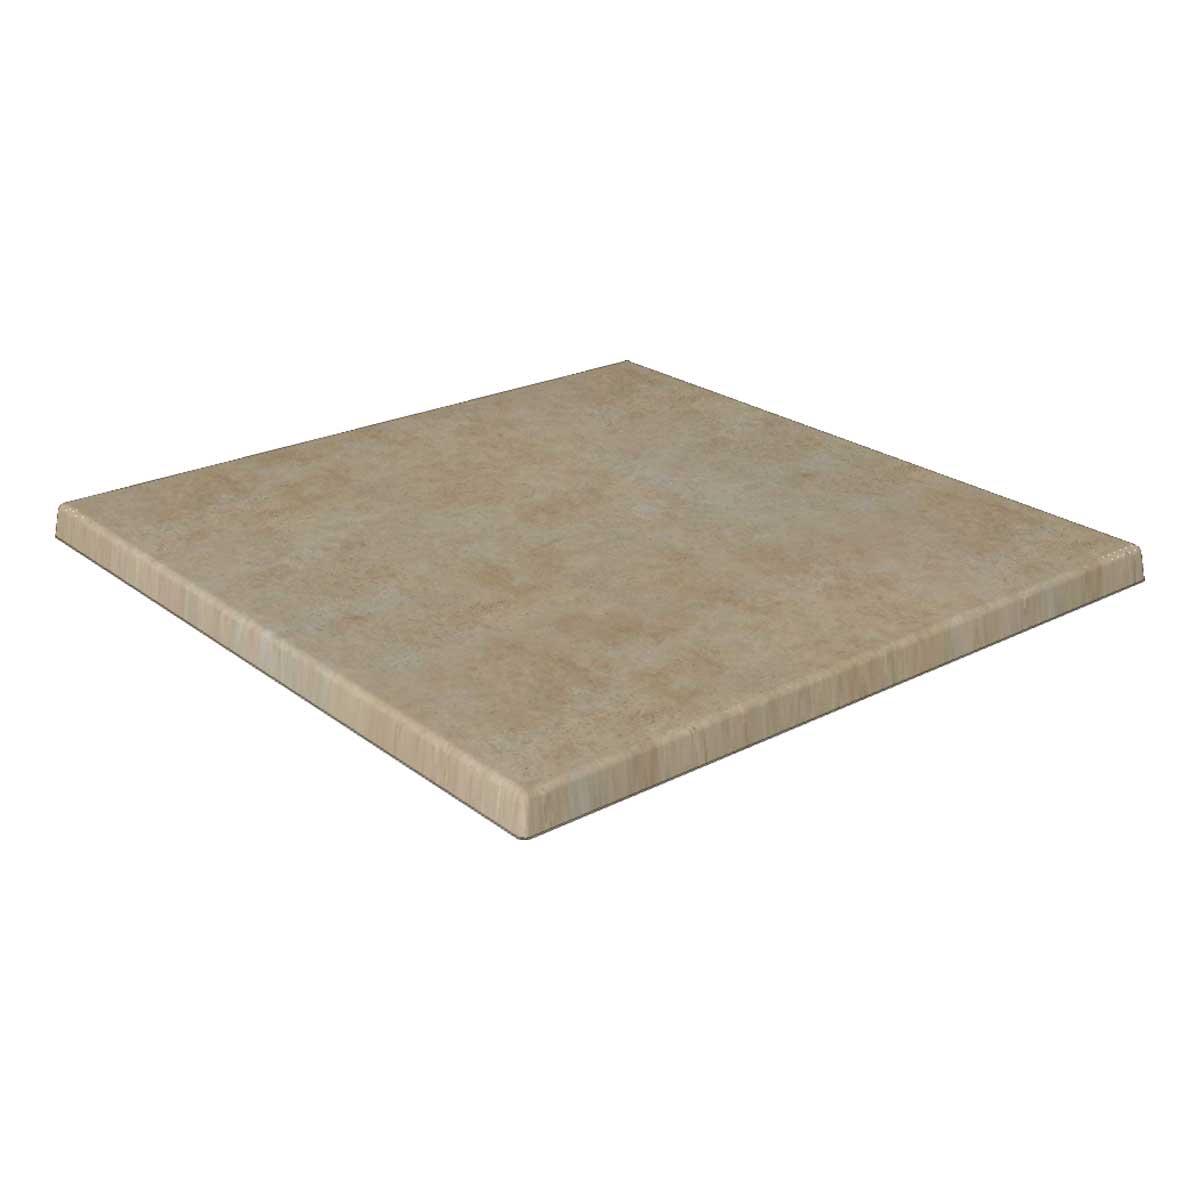 TICLA Q70 306 - https://www.werzalit.com/nl/product/tafelblad-classic-werzalit-q-70x70-306-catalan/